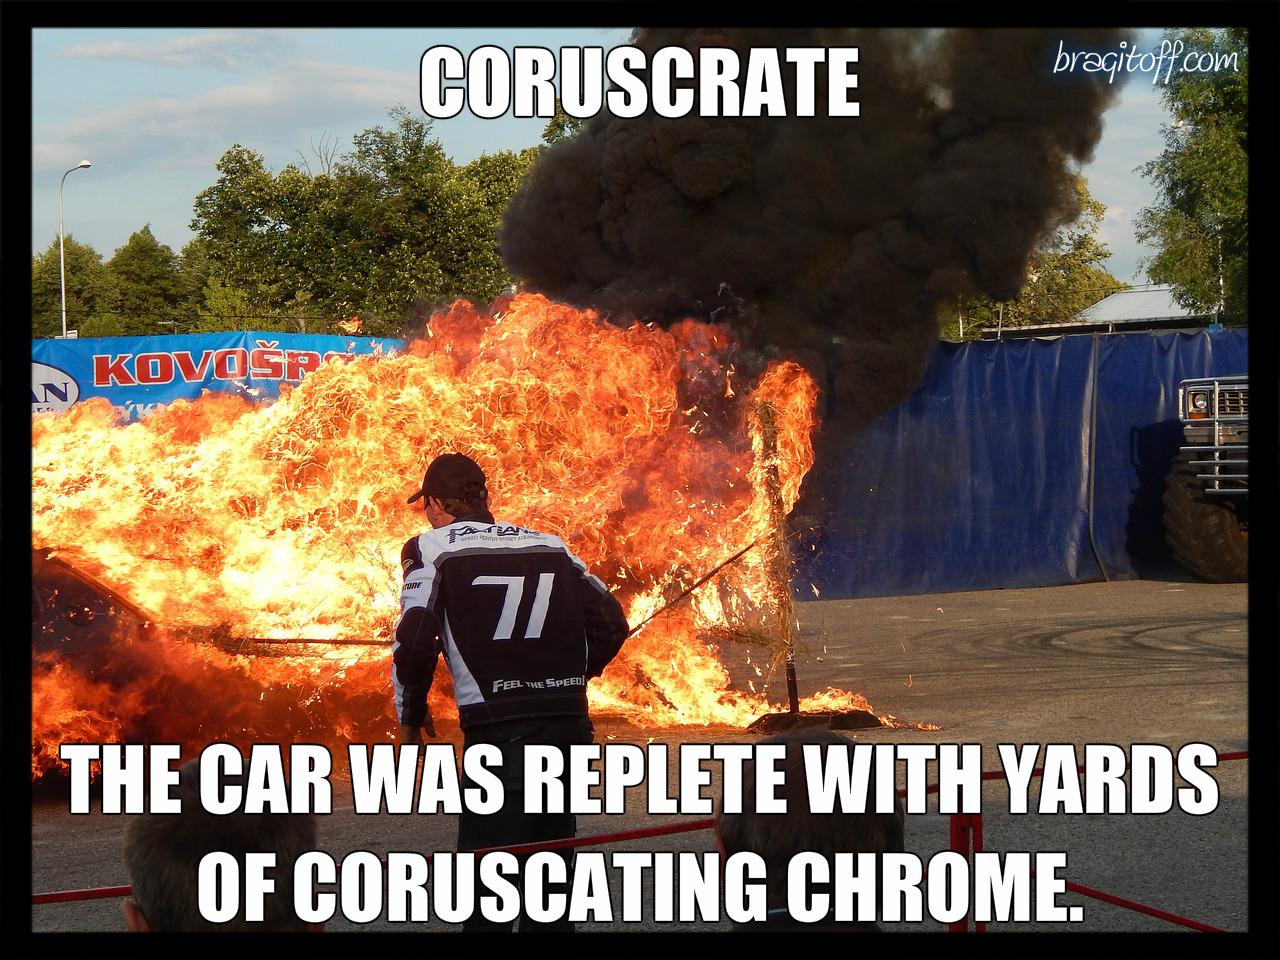 coruscrate definition sentence image visual meaning definition visual dictionary meaning bragitoff